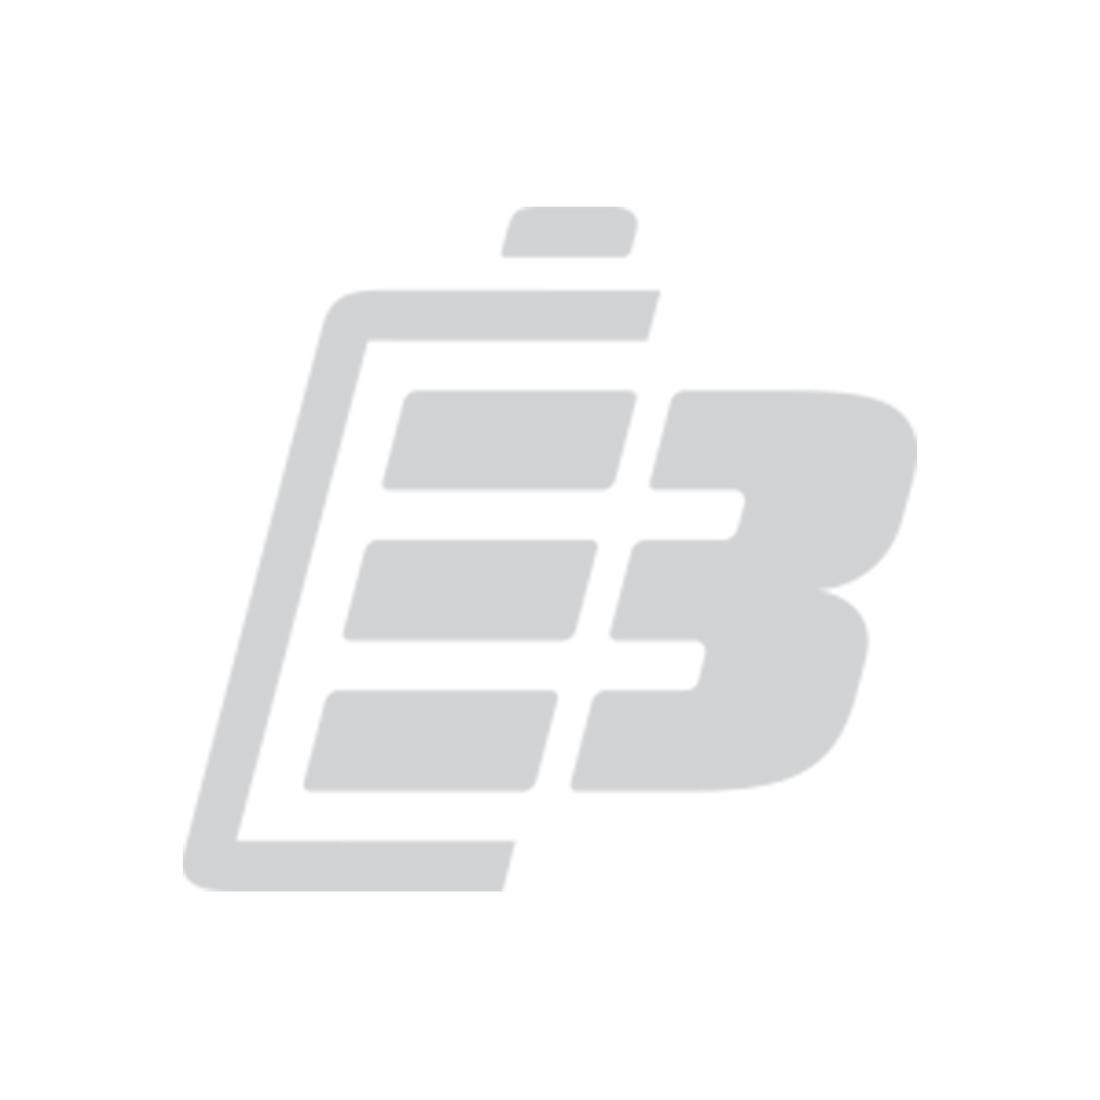 MP3 battery Apple iPod Nano 1st generation_1